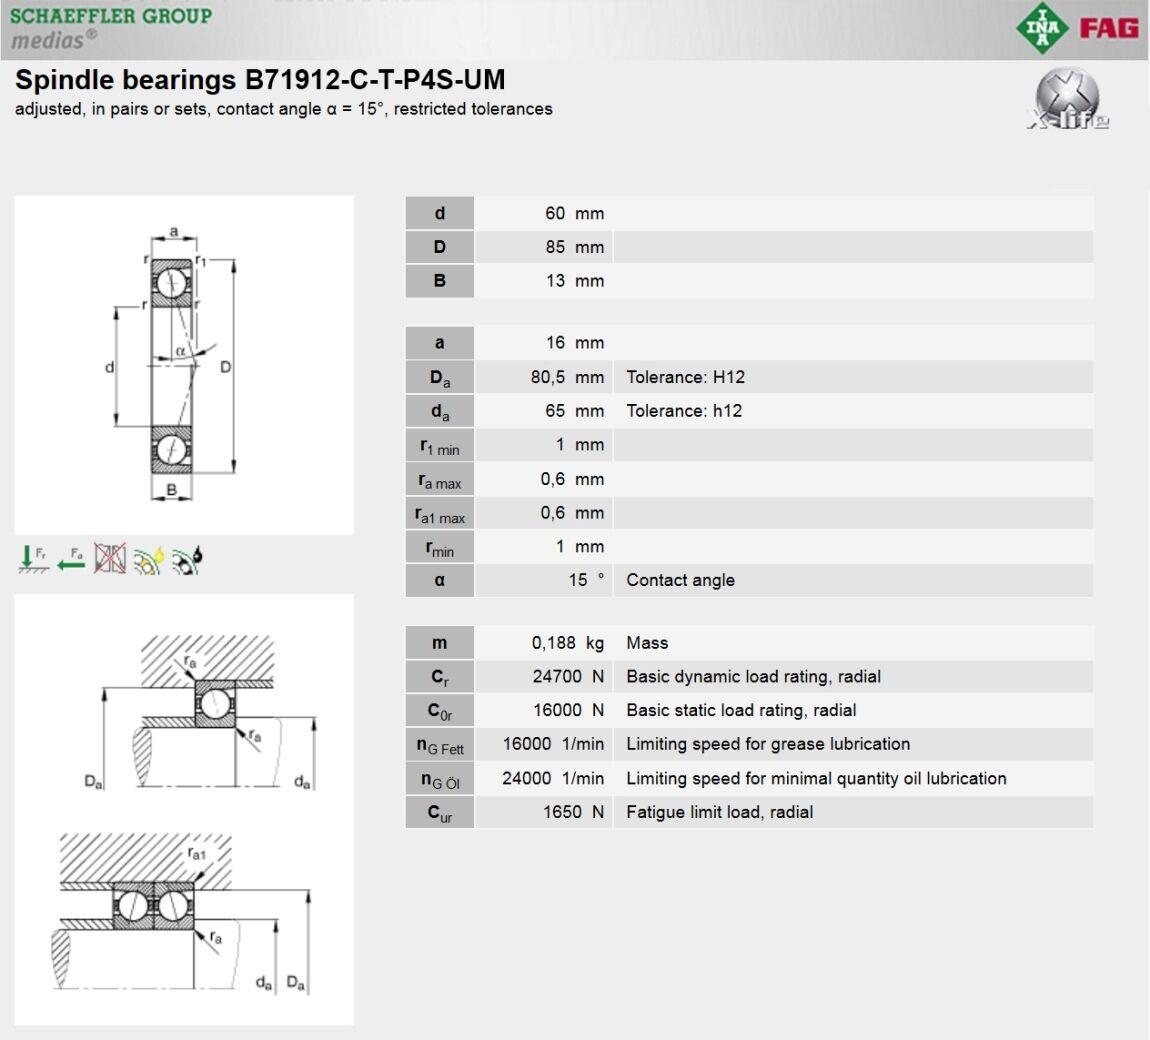 TIMKEN FAFNIR 3MM9107WI DUL FAG B7007EB T P4S UL SUPER PRECISION BEARINGS